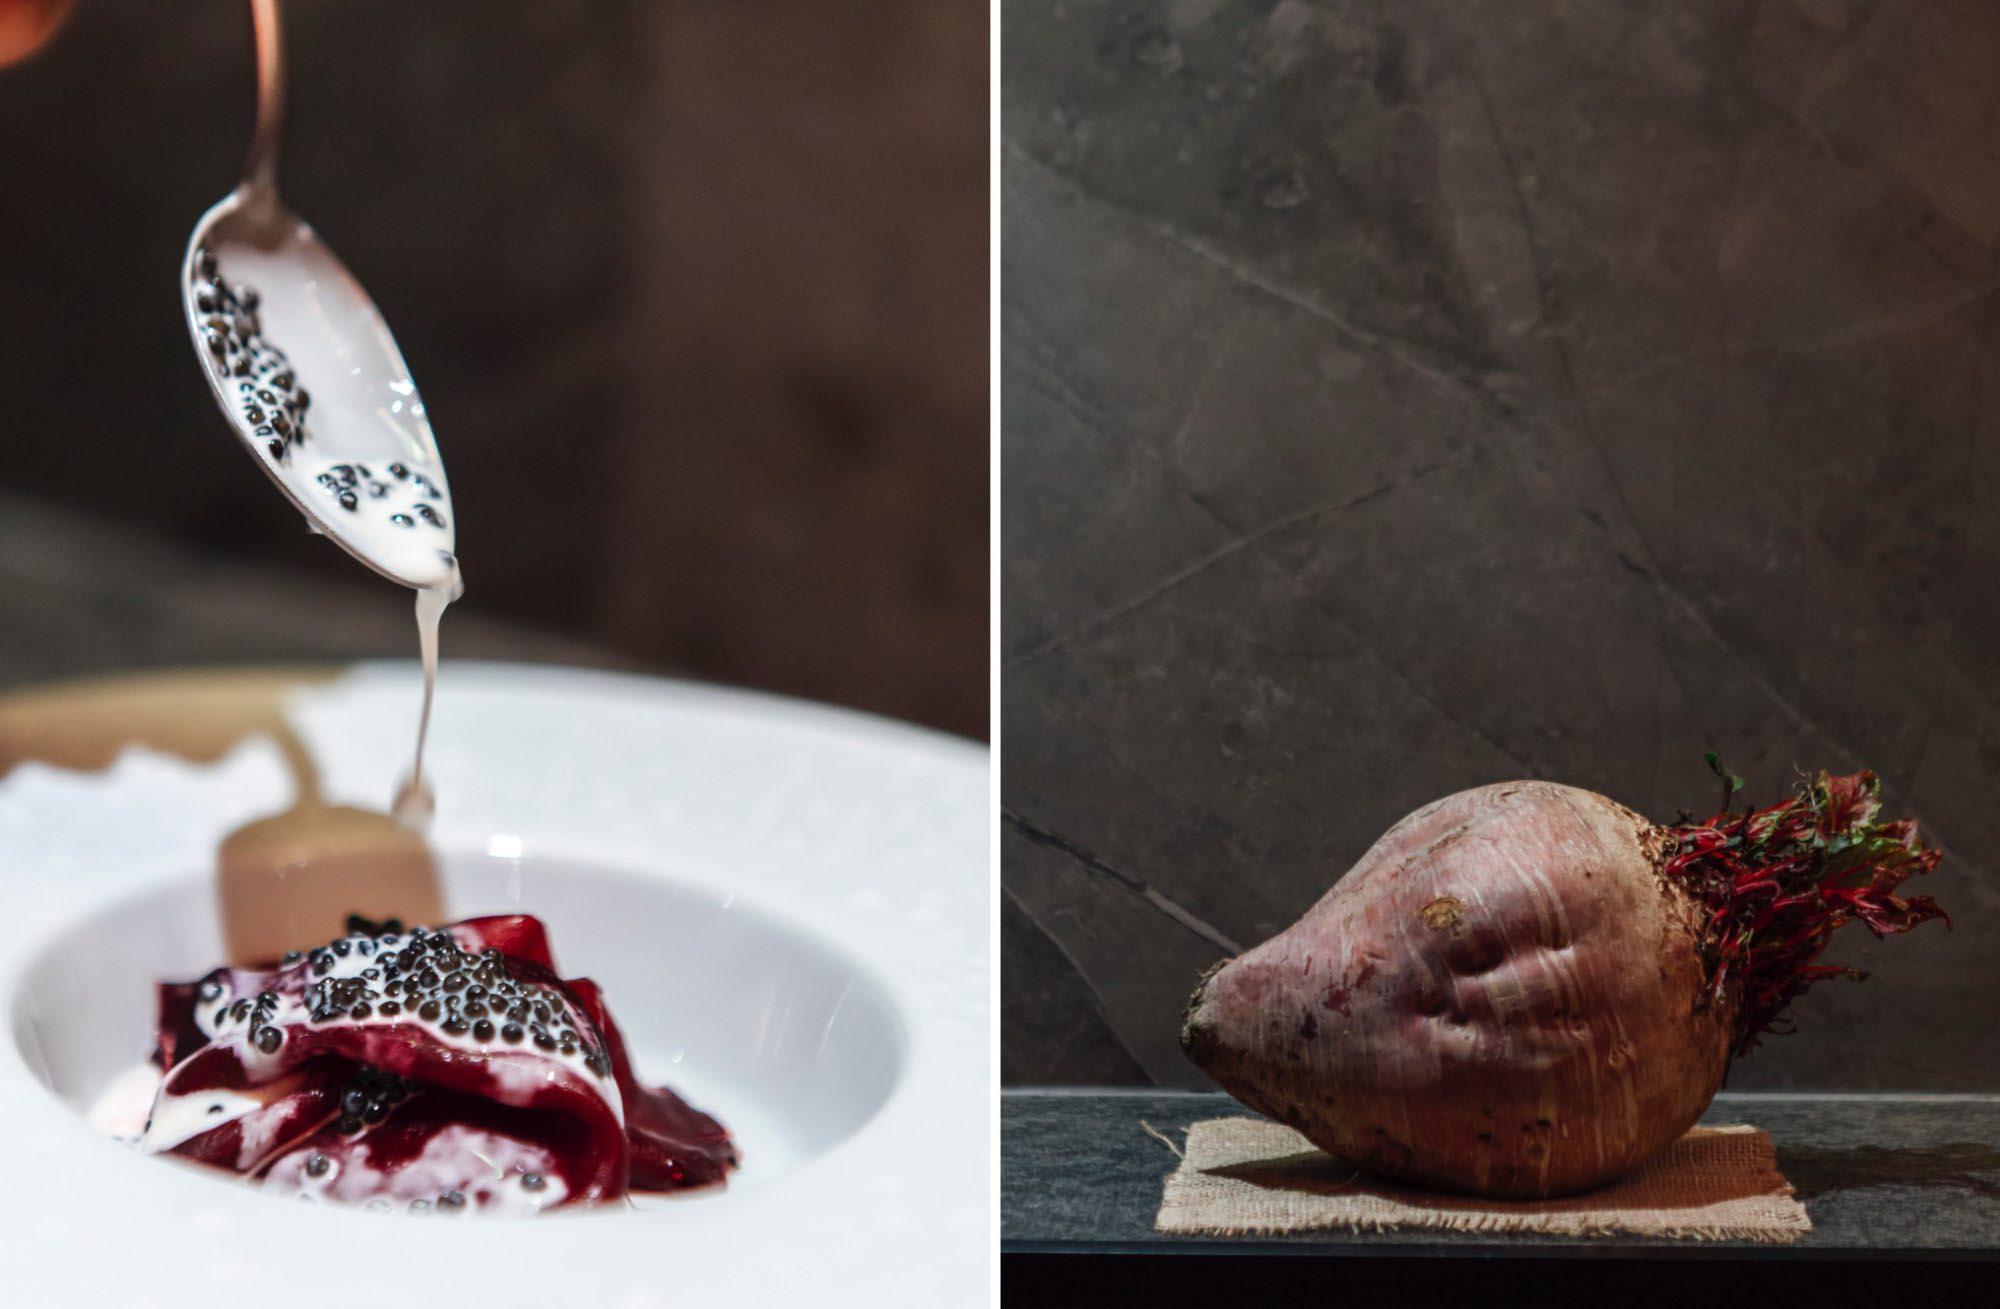 Remolacha Crapaudine cocida en costra de sal con salsa de caviar Osetra.